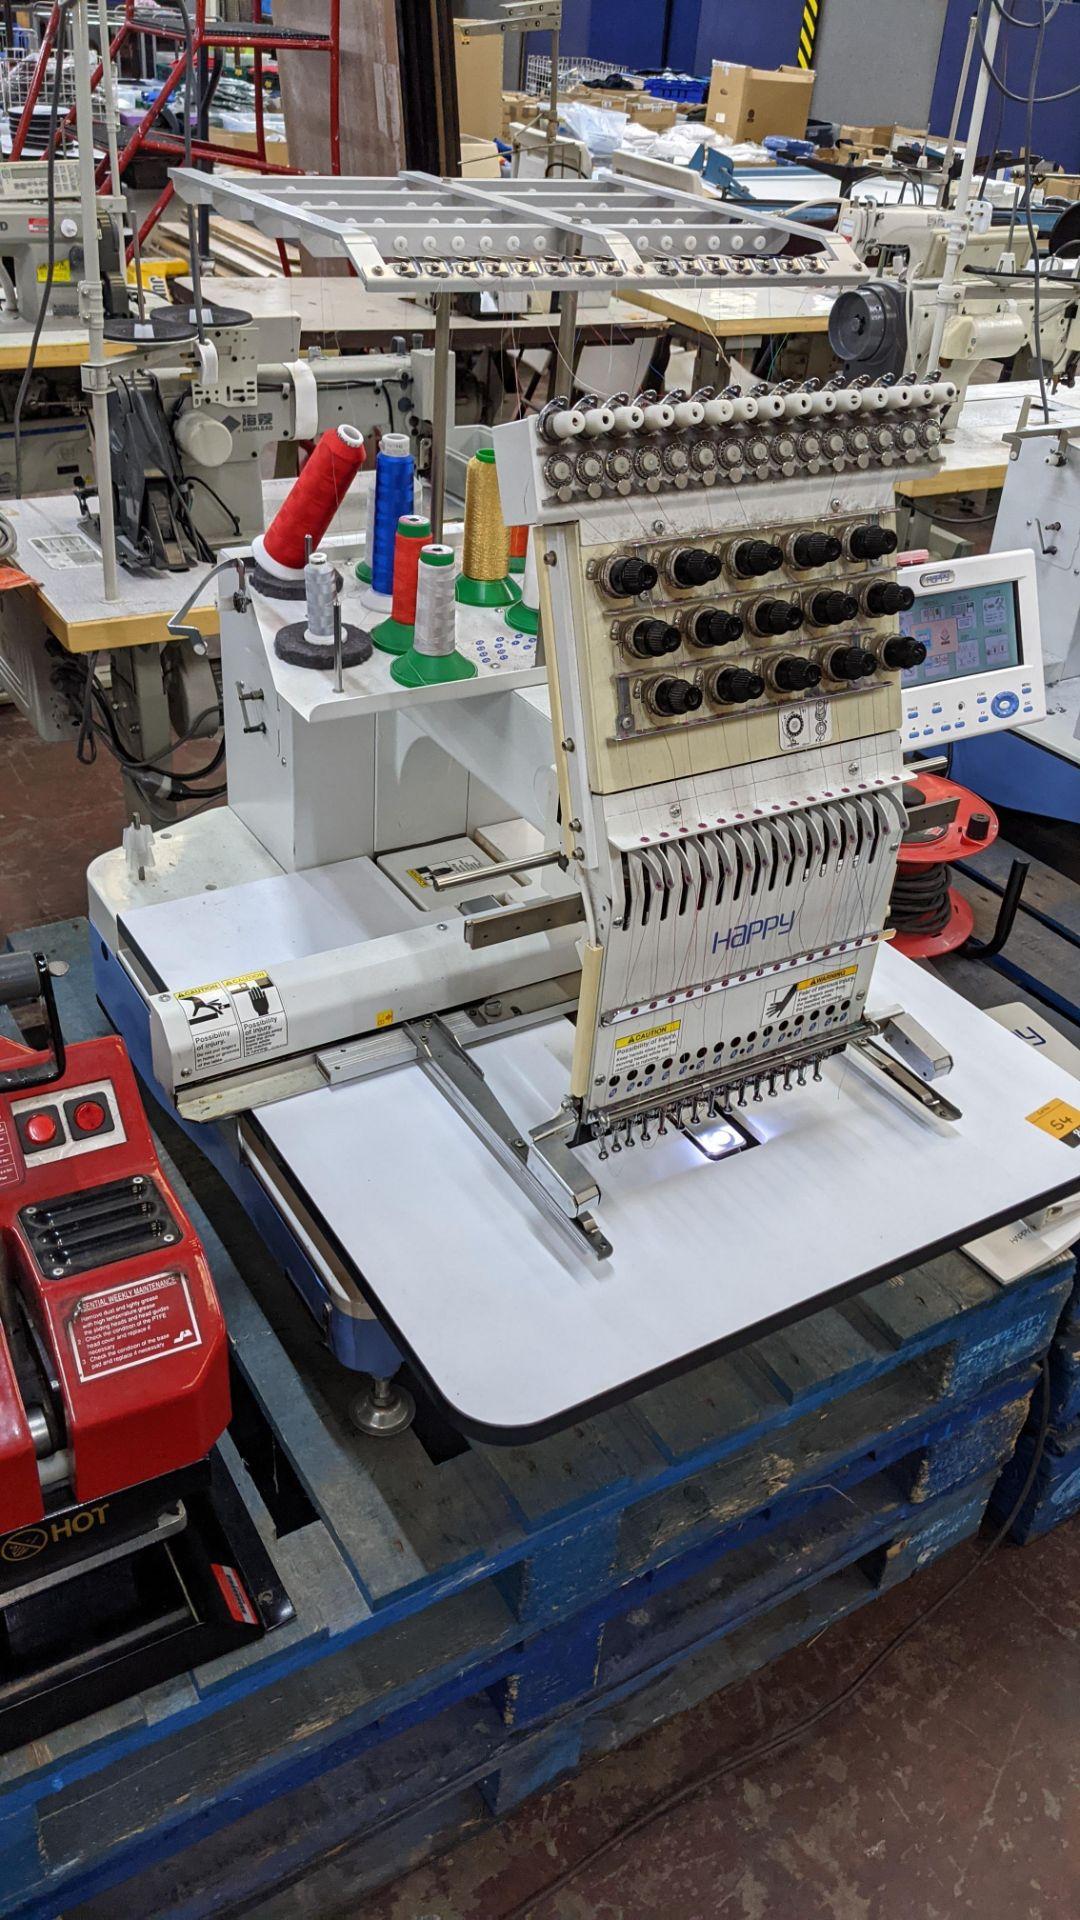 Happy single head embroidery machine model HCD-1501-40 - Image 10 of 22